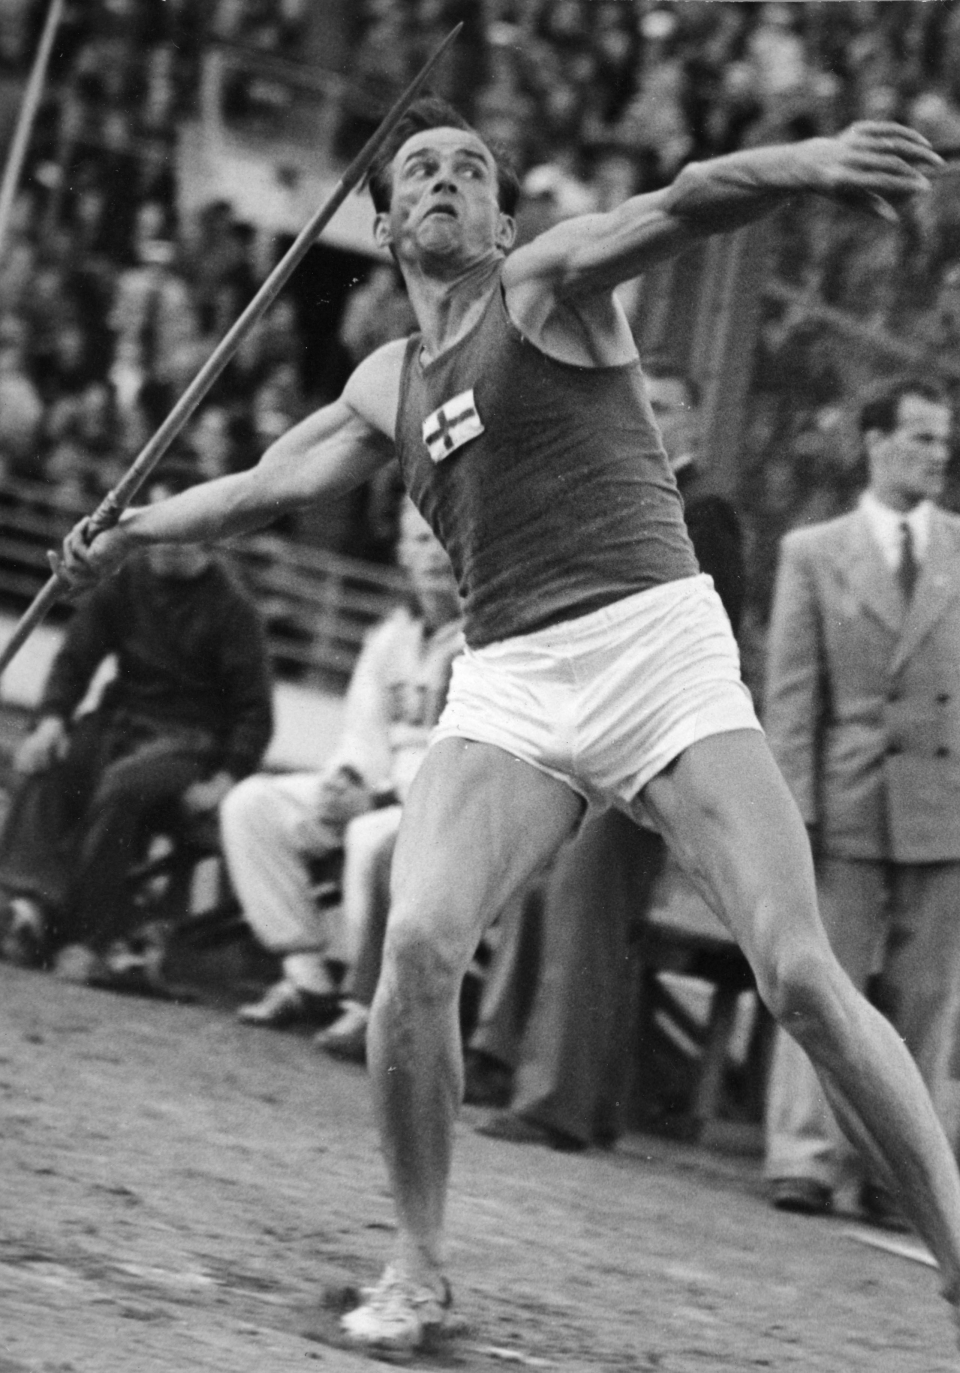 Tapio Rautavaara 1947